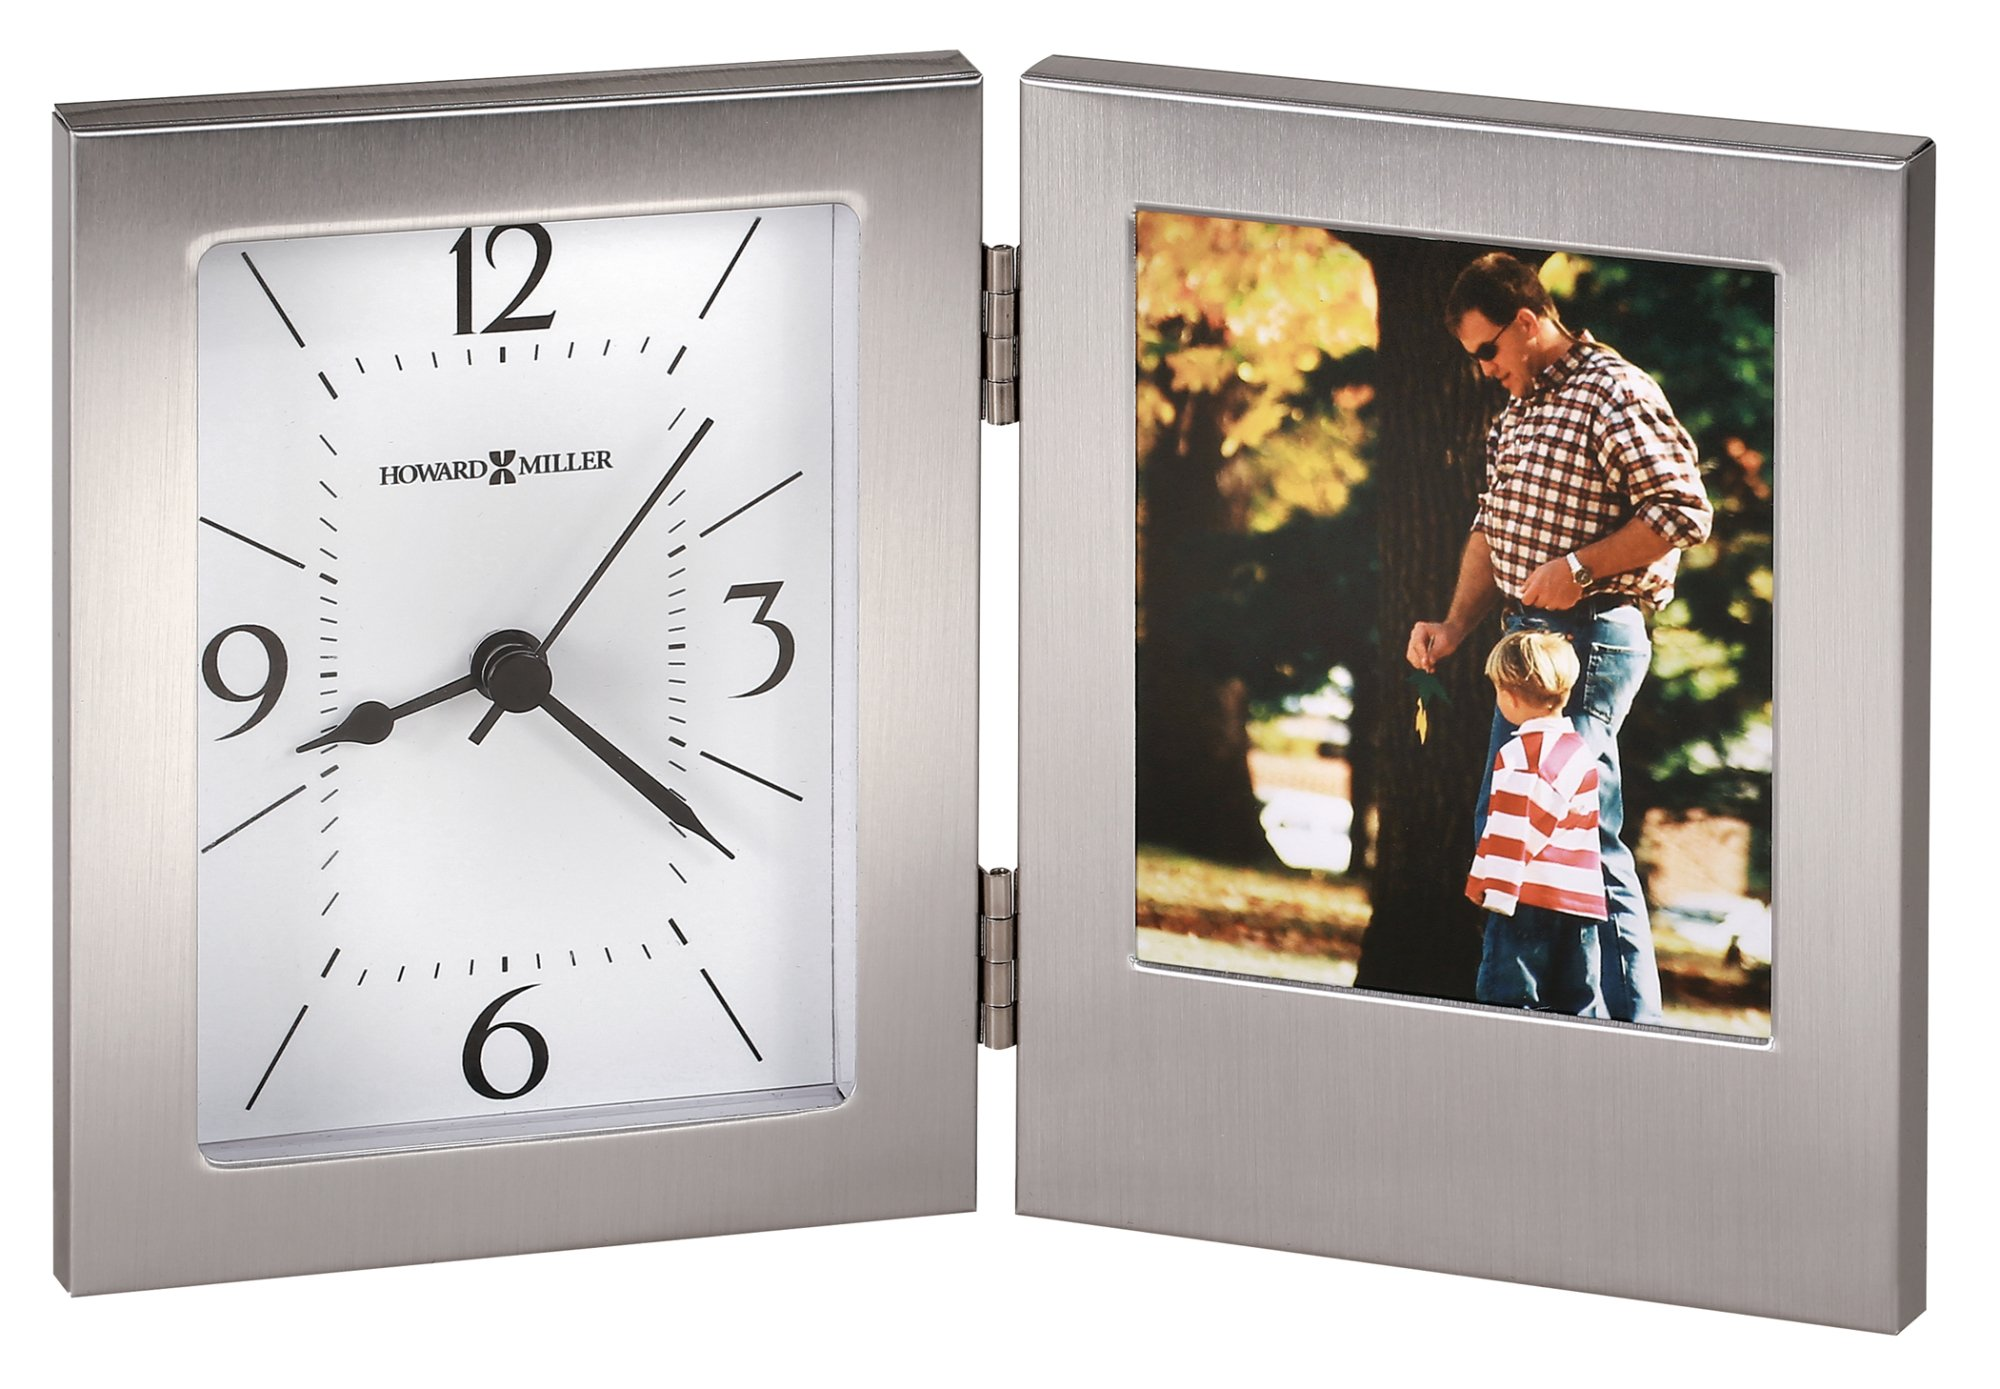 Howard Miller Envision Clock